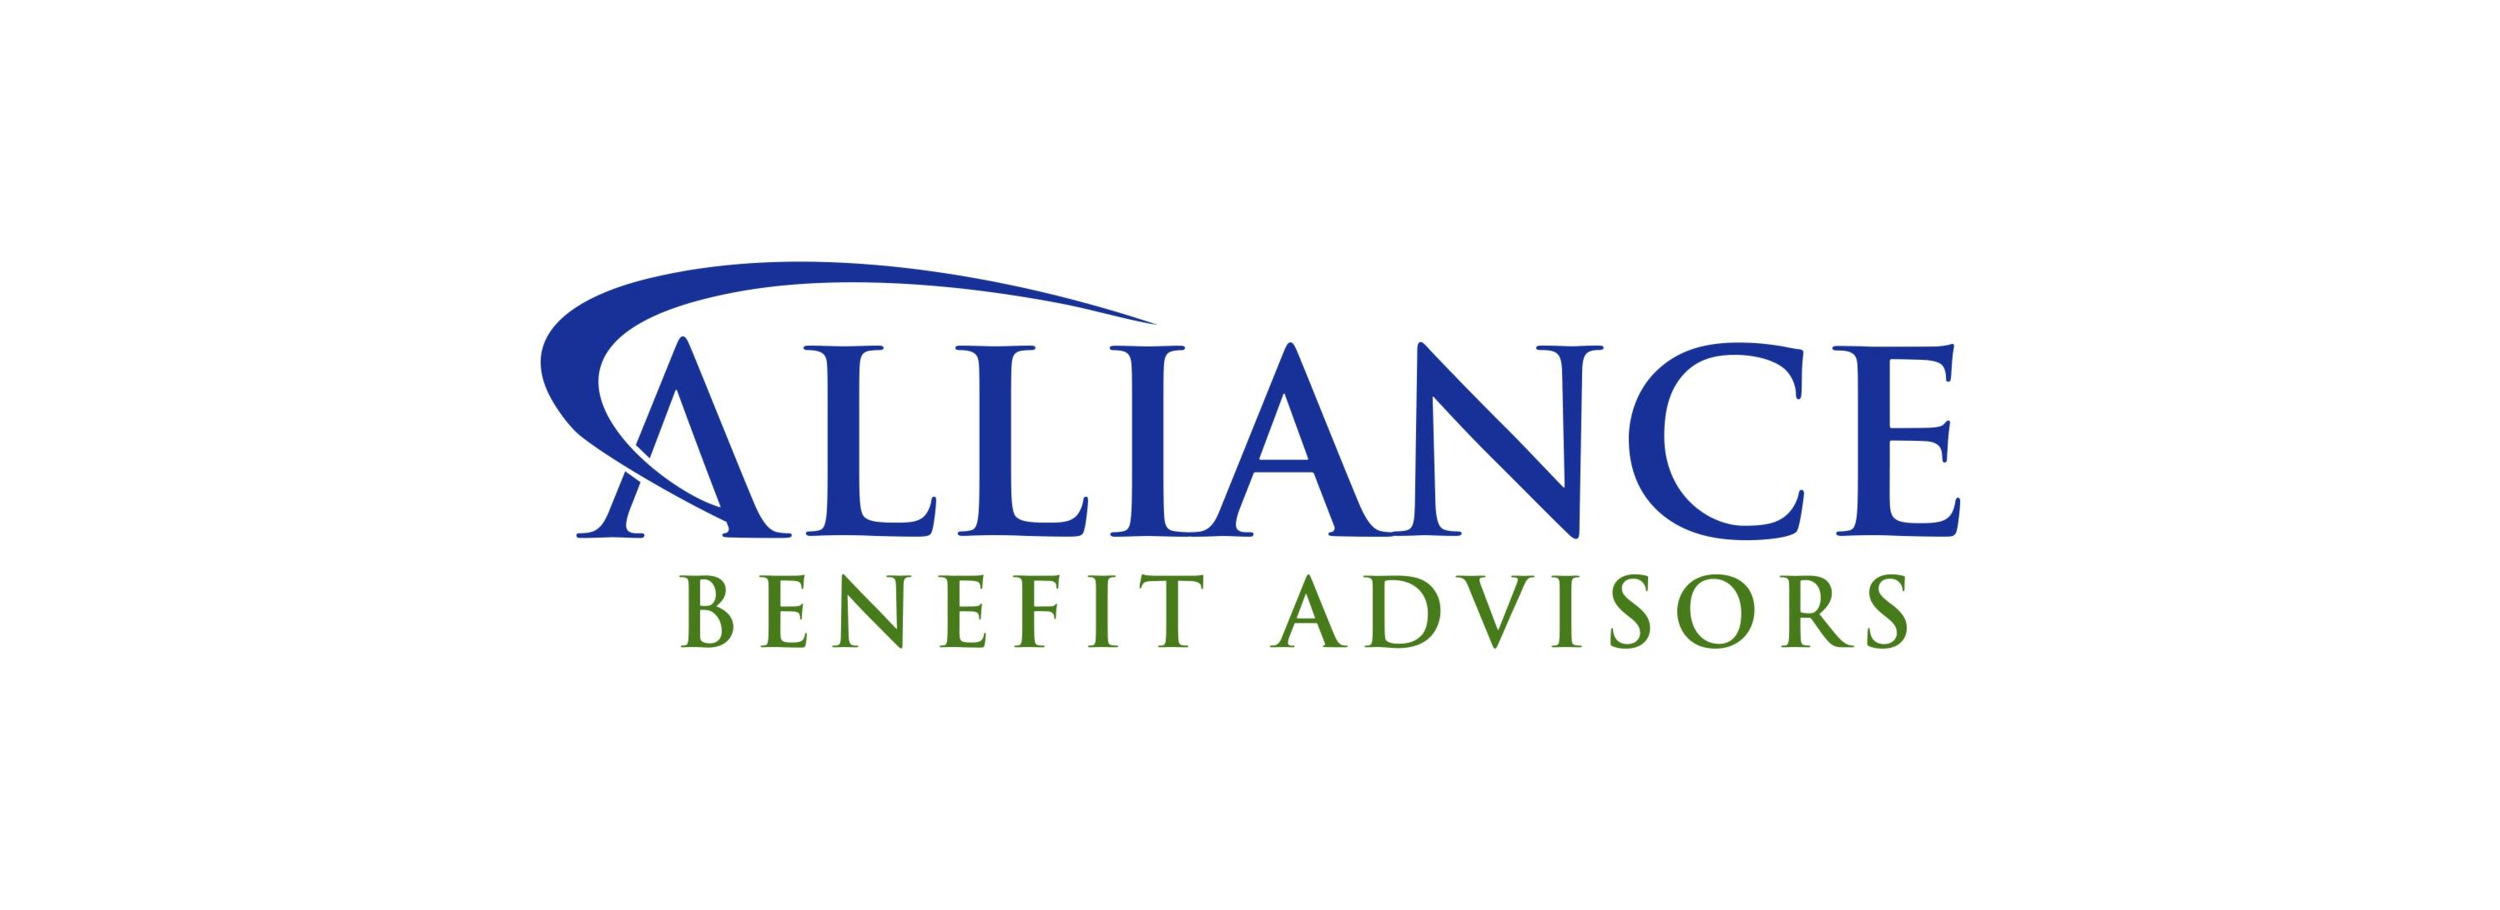 alliance_benefit_advisor_logo.png